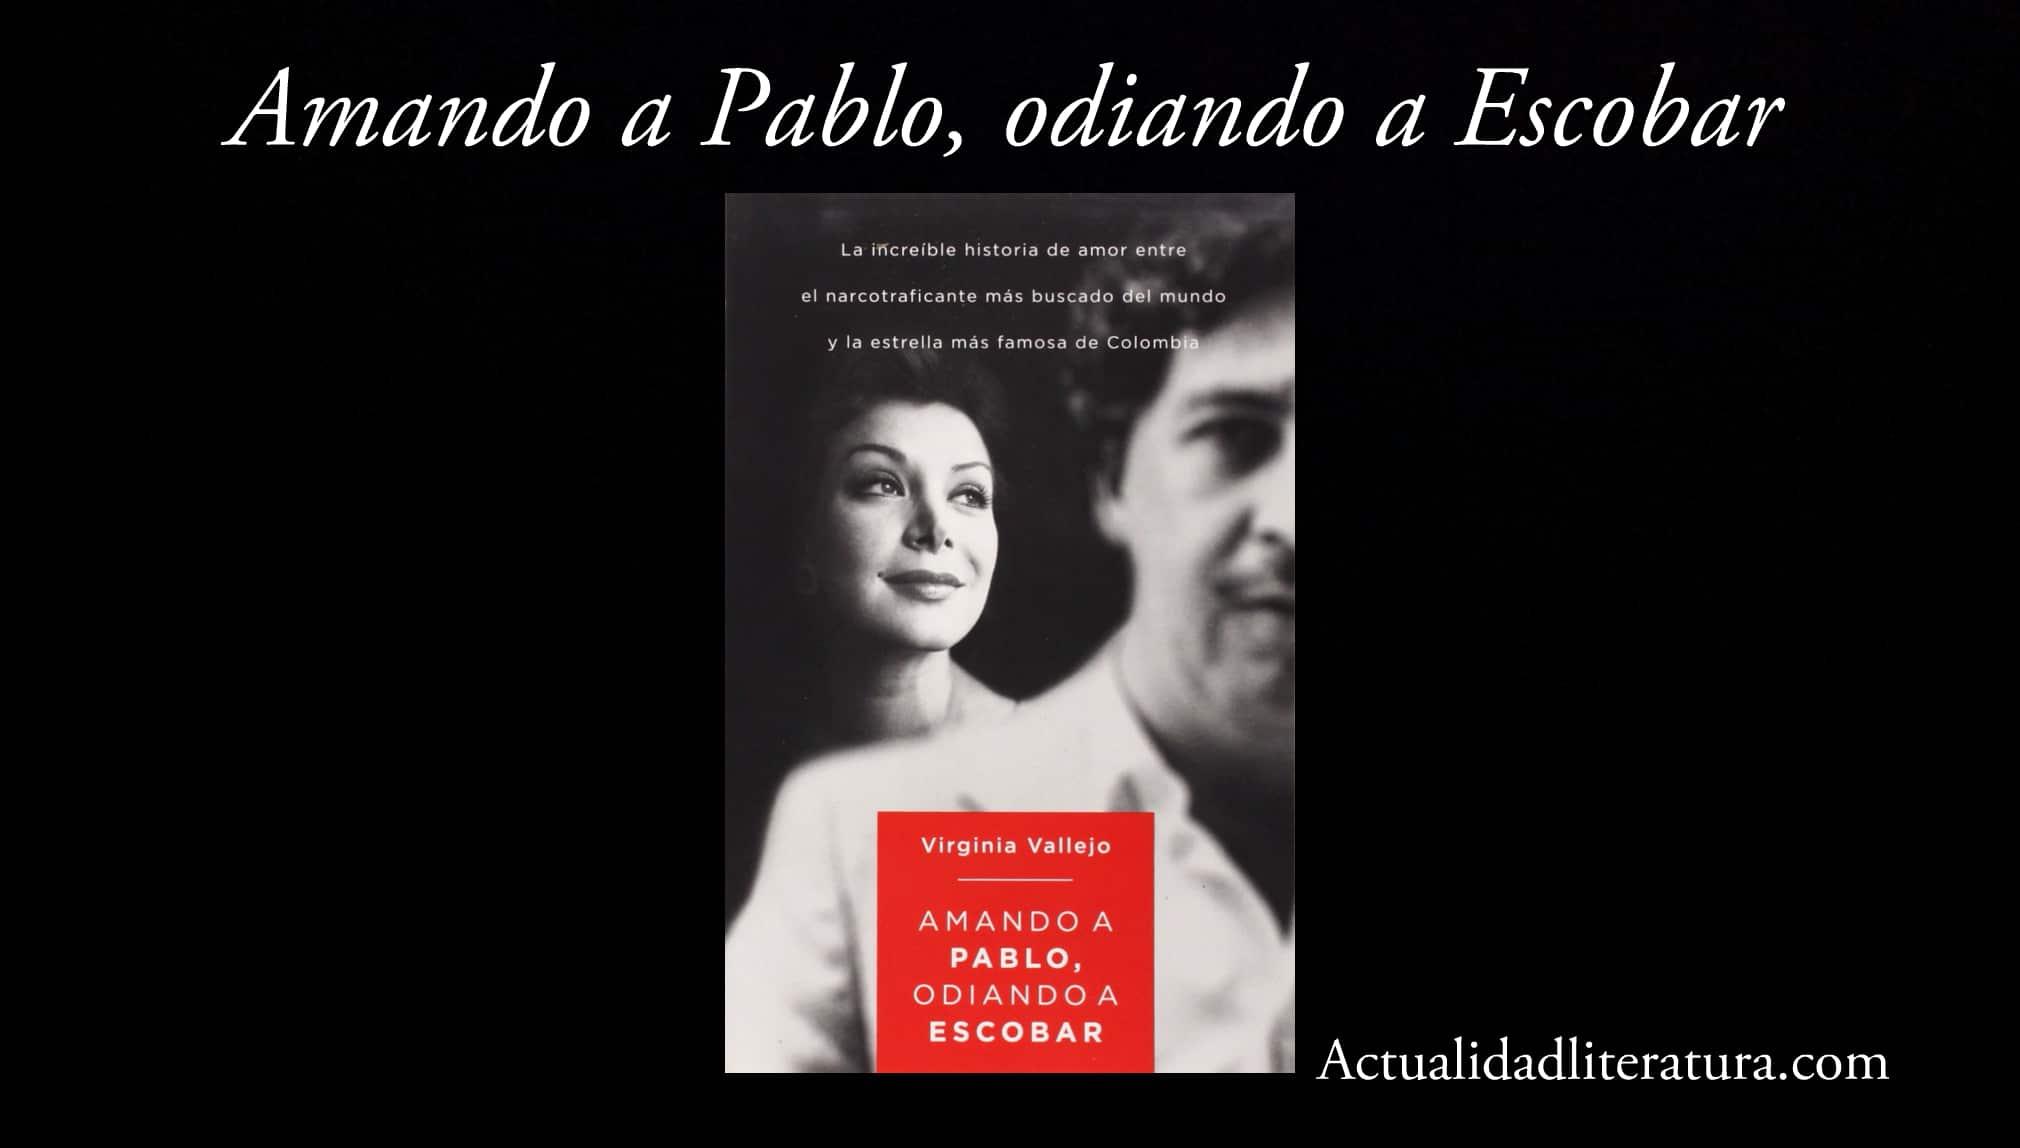 Amando a Pablo, odiando a Escobar.